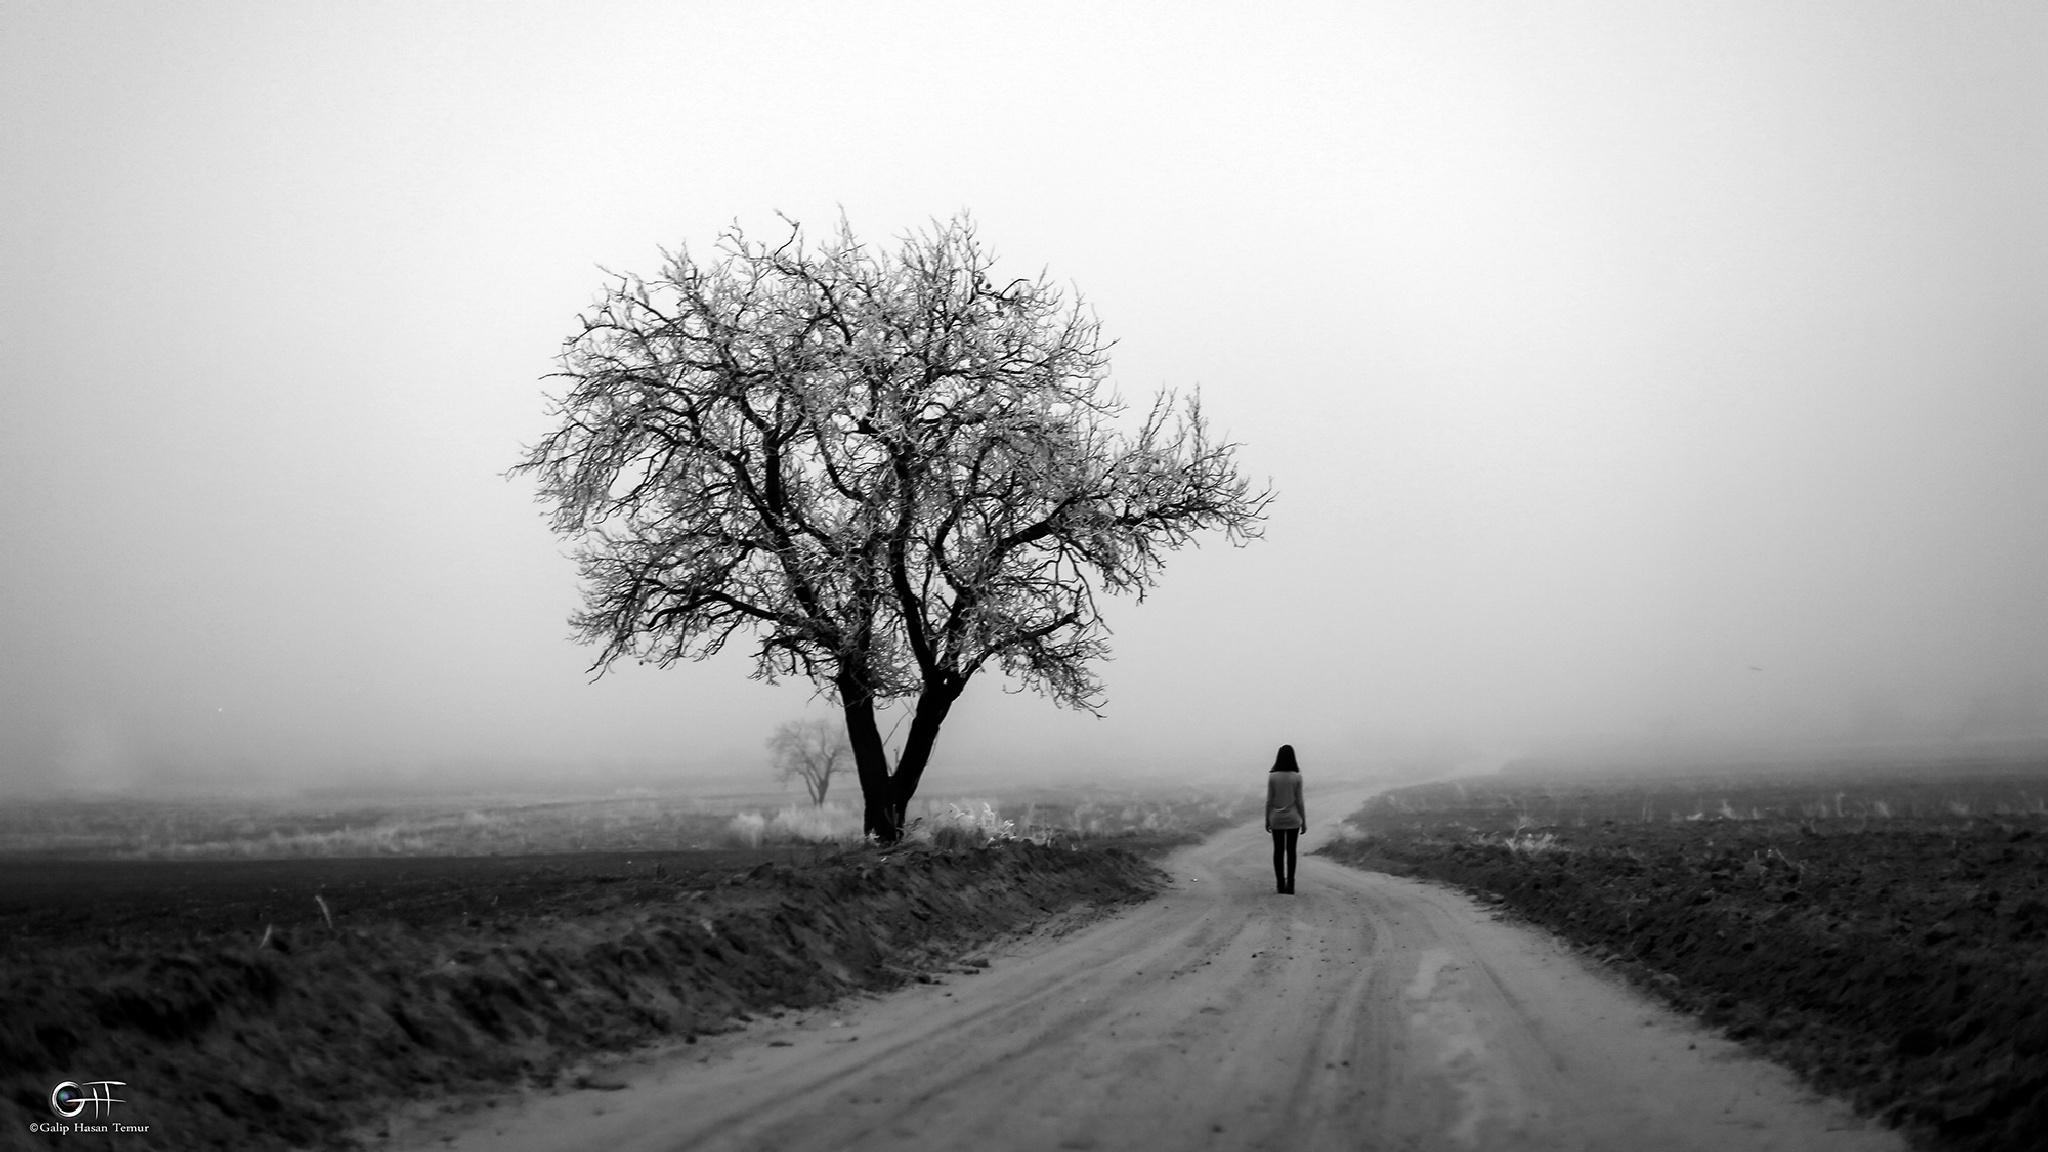 fog 1.2 by Galip Hasan Temur